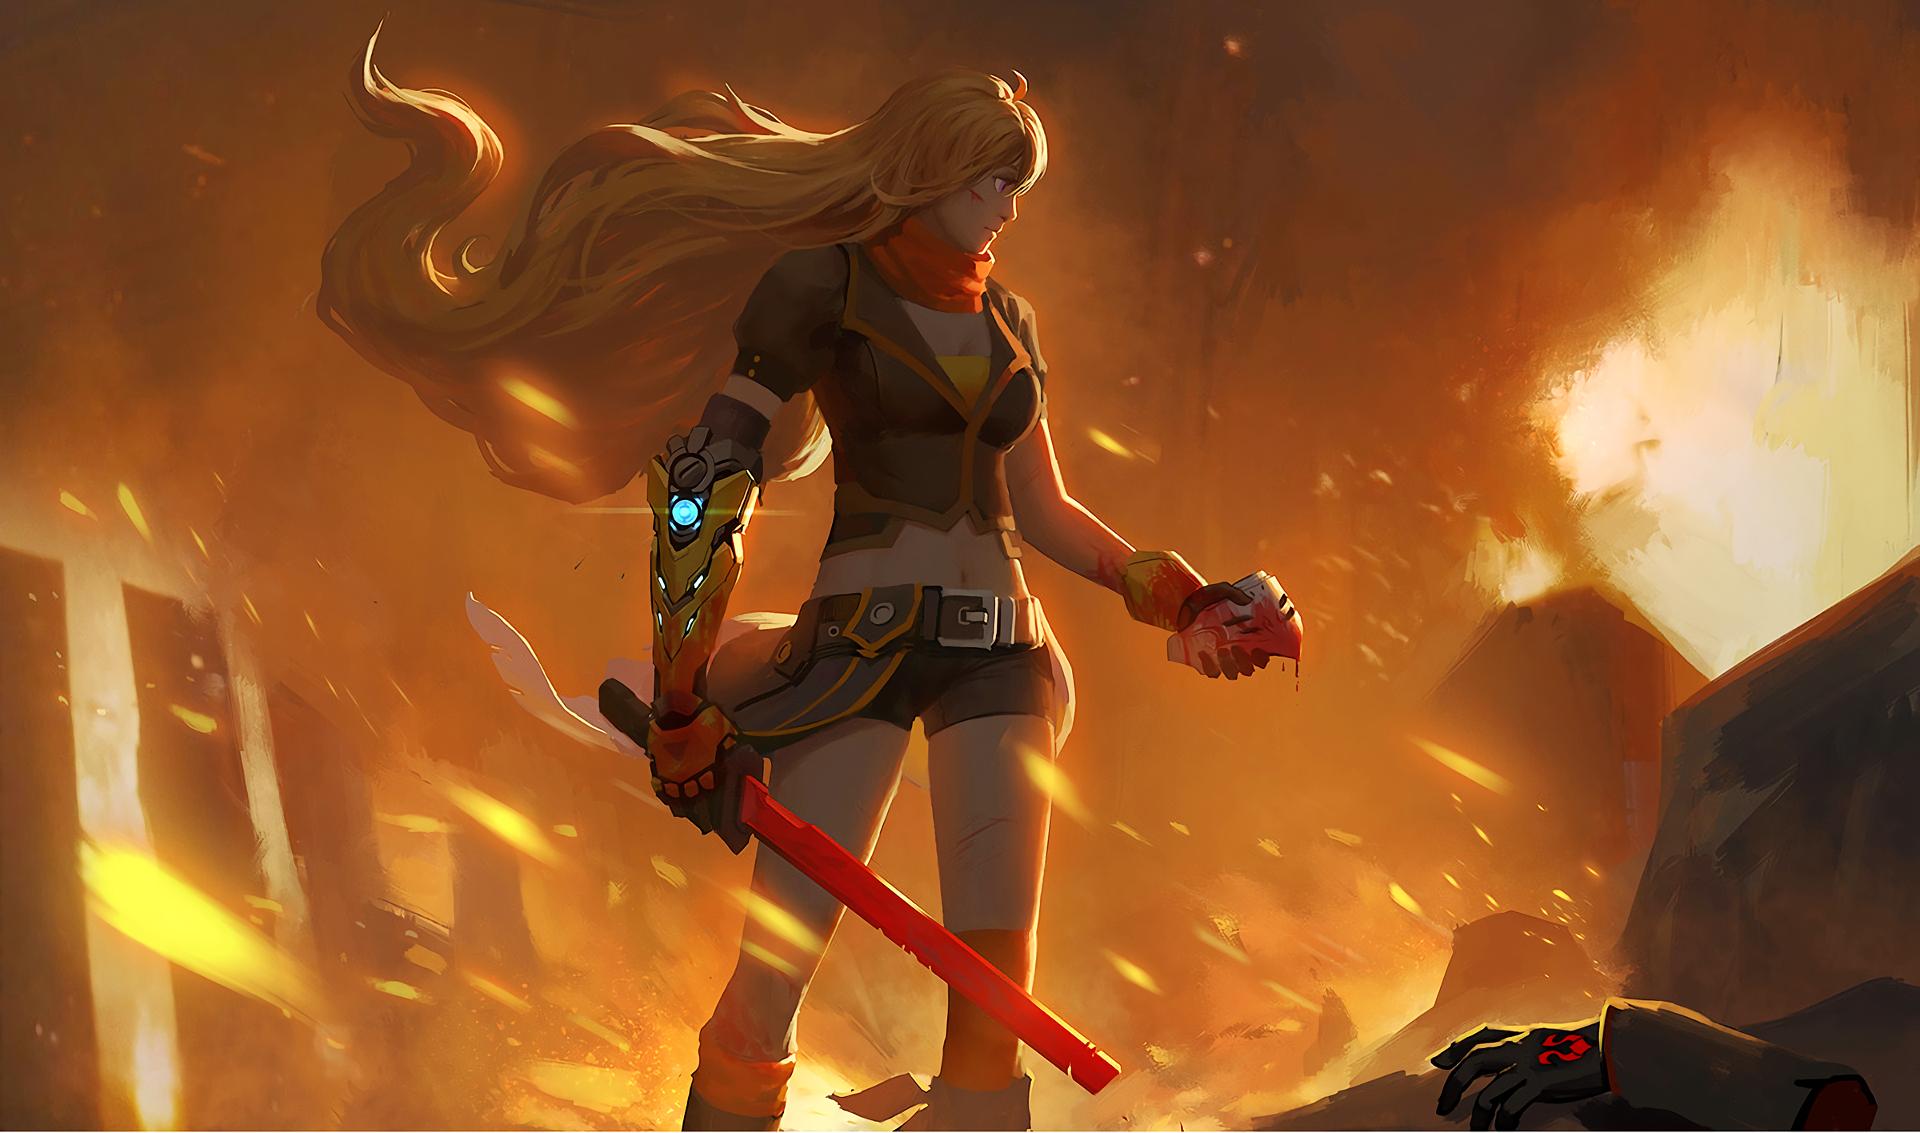 Vengeance HD Wallpaper   Background Image   1920x1133   ID ...